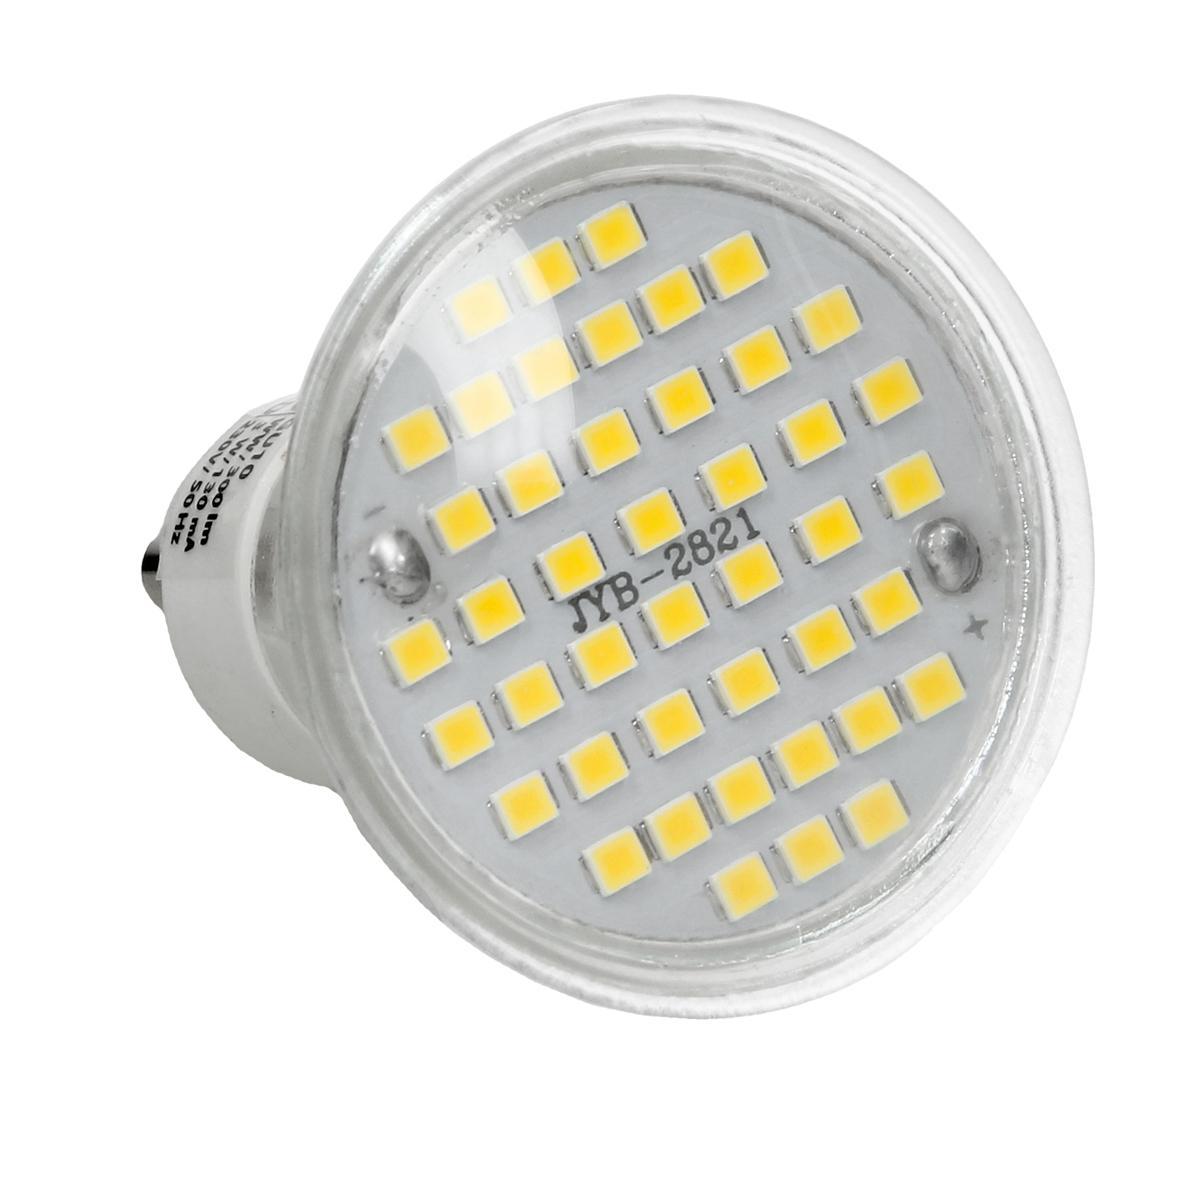 Ecd Germany ECD Germany 20 x LED GU10 44SMD Spot 3W - Lampe à LED 20W - en verre - 251 lumens - Blanc chaud 3000K - Spot à encastrer